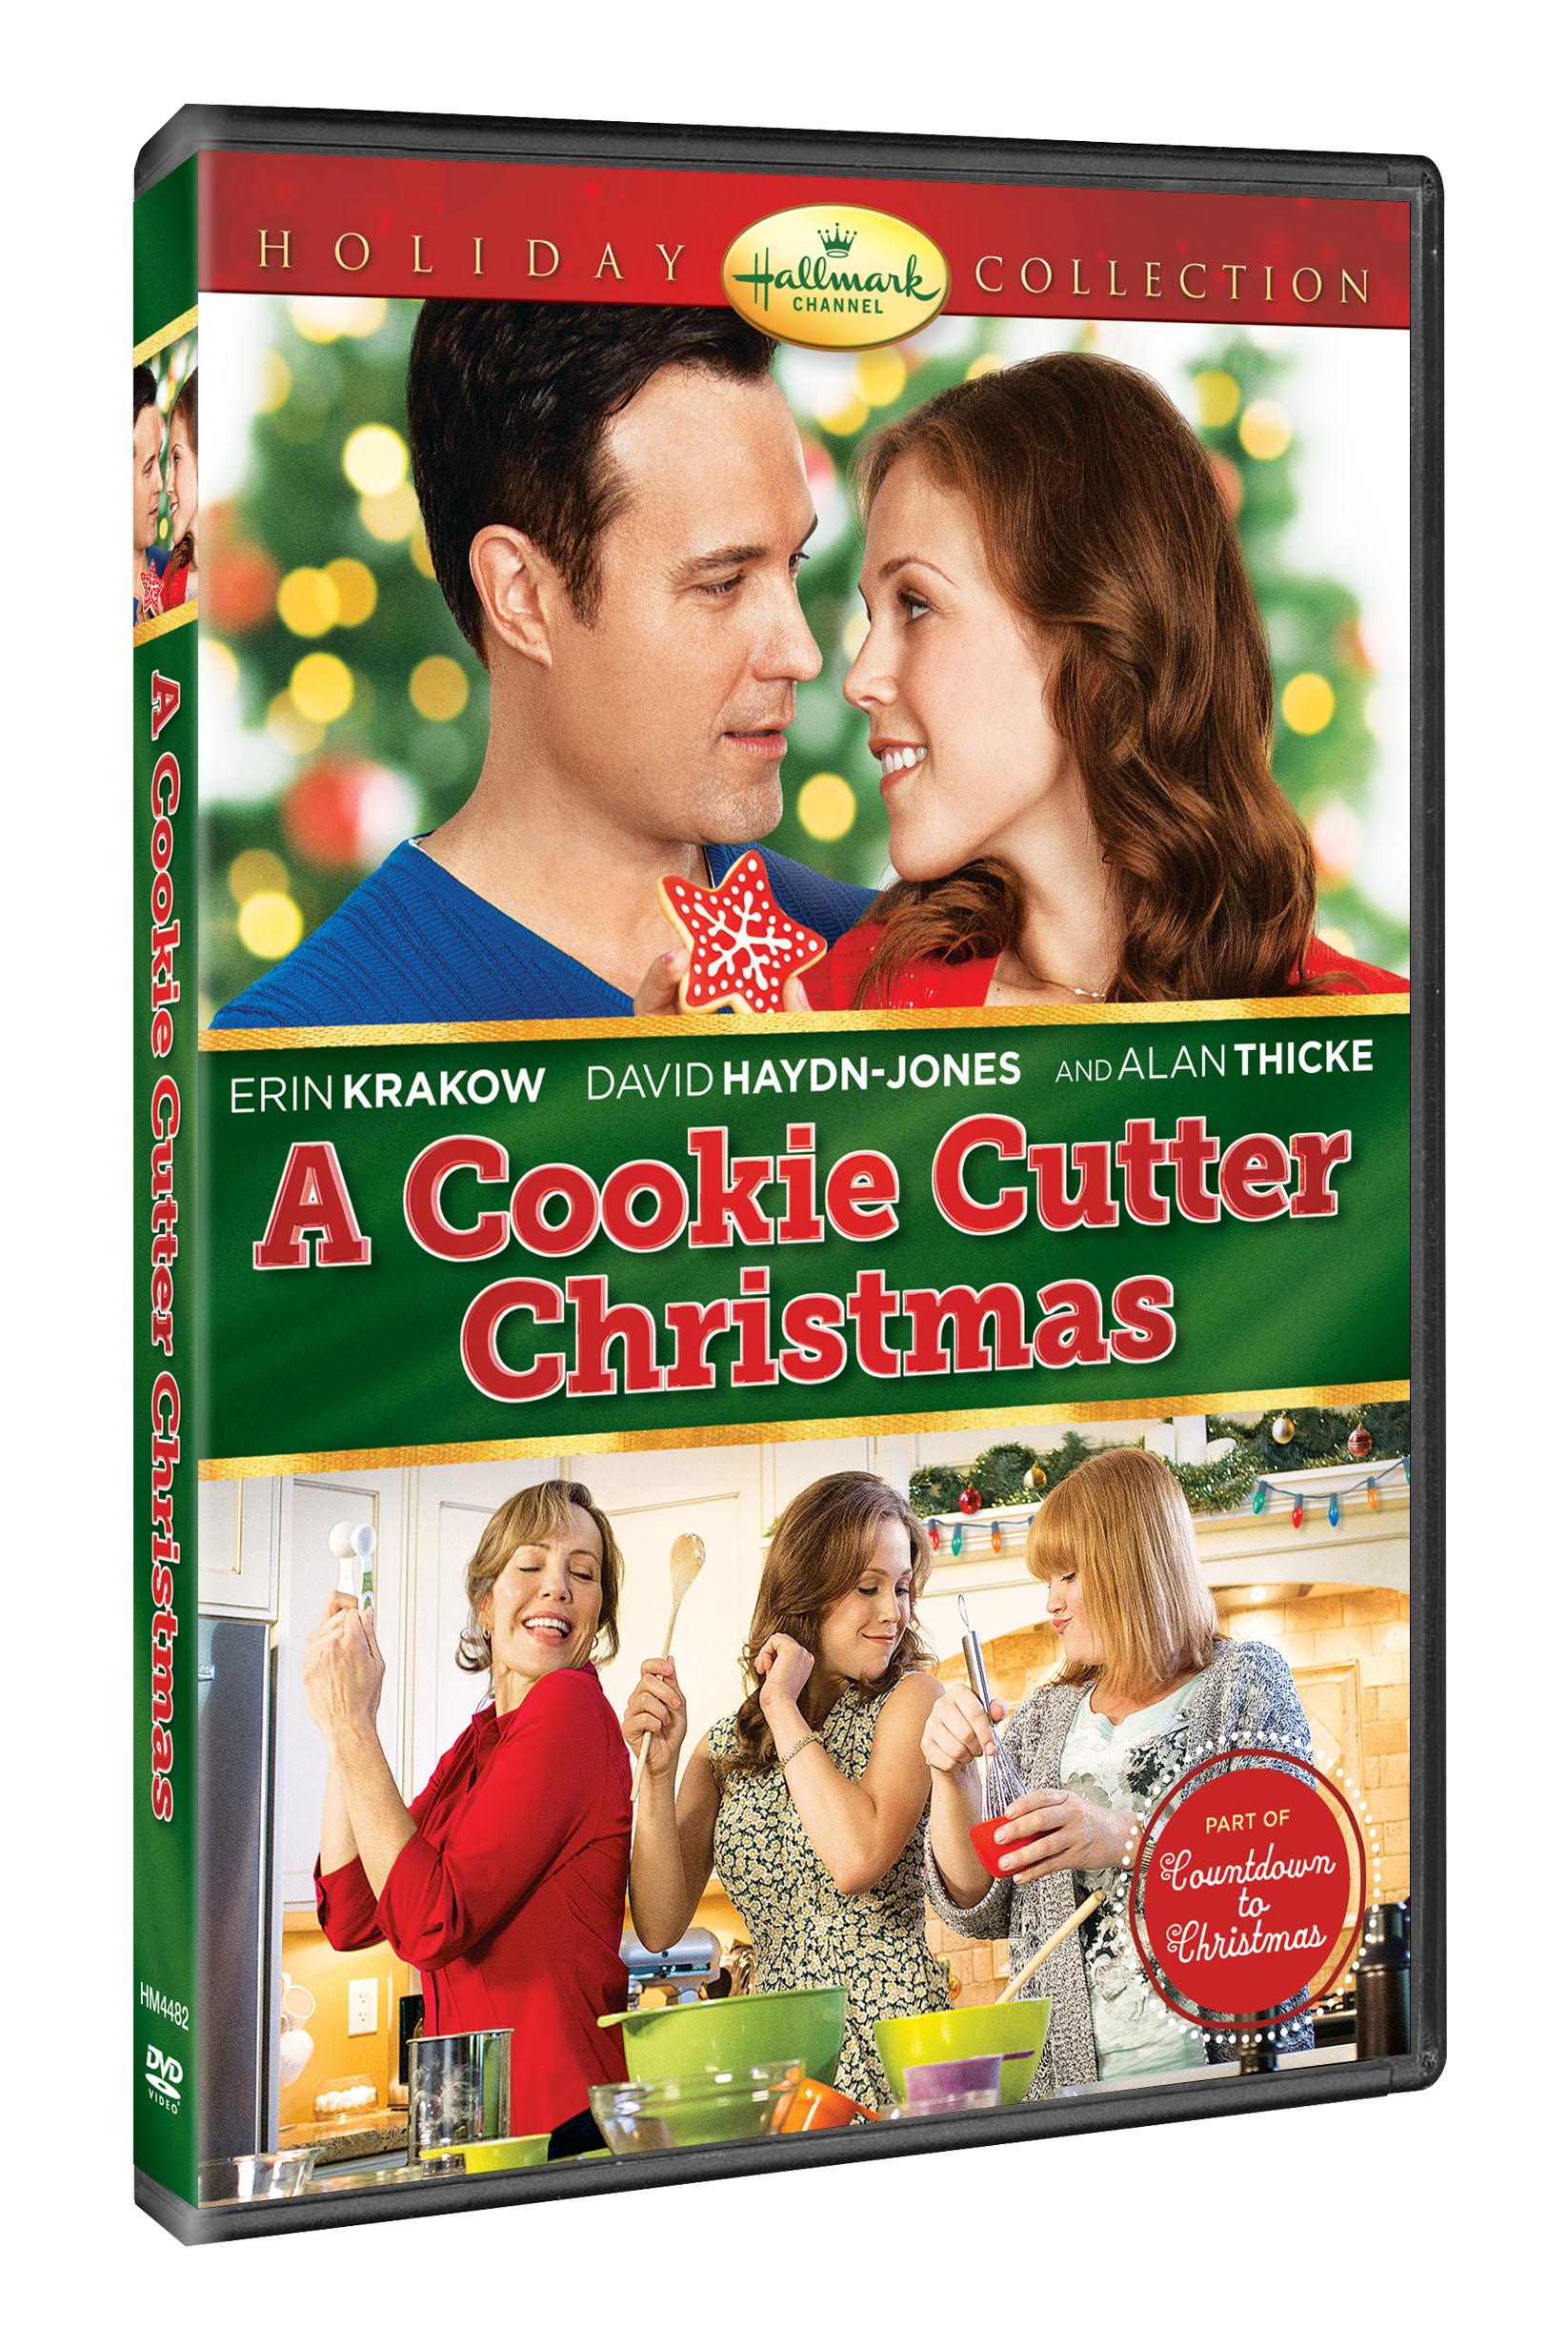 Cinedigm Releasing Four Hallmark Christmas Titles This Season ...